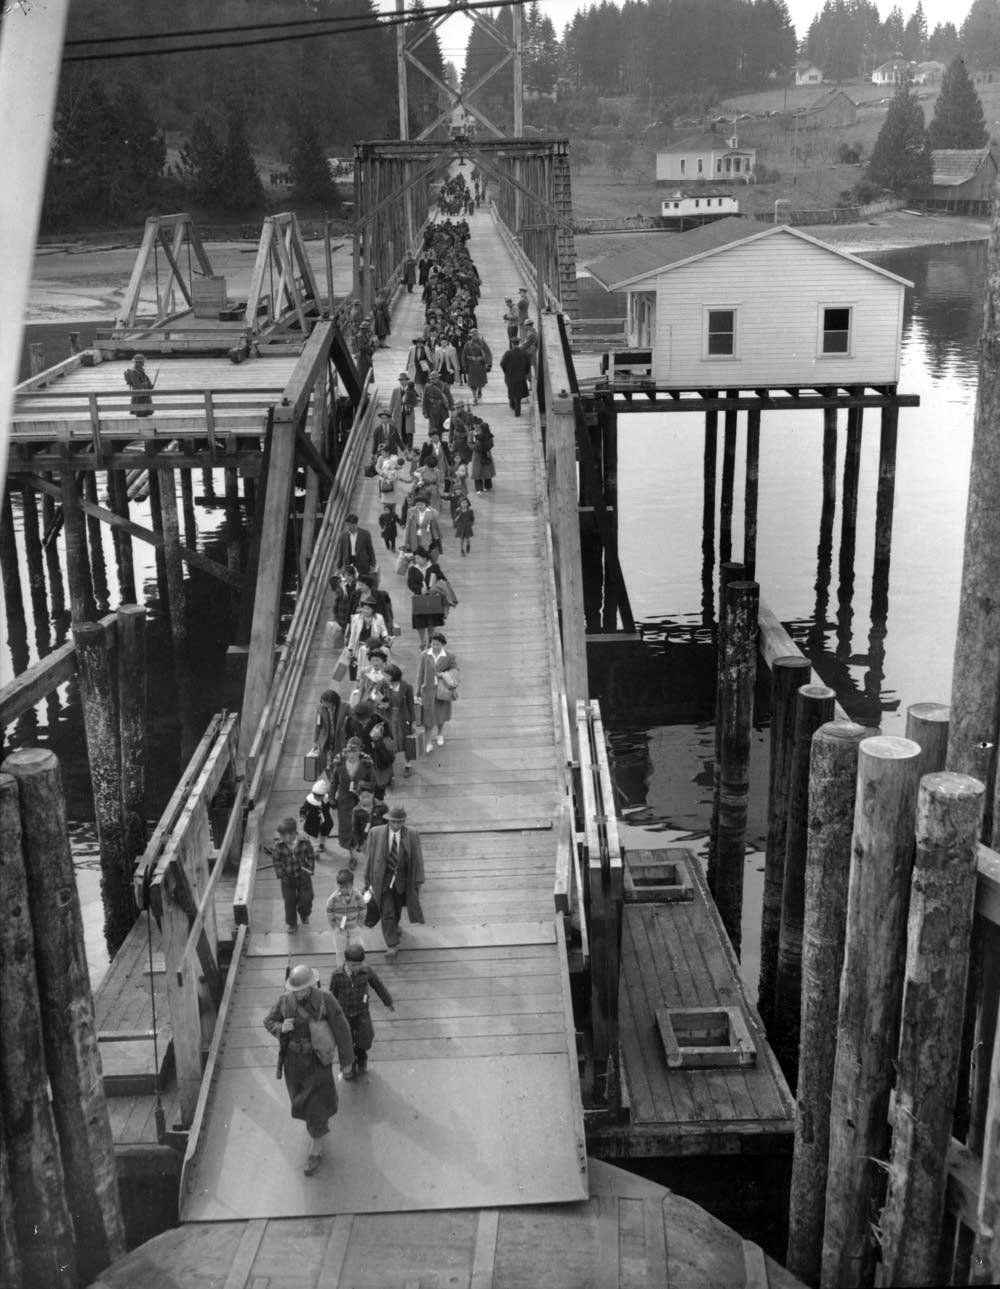 Eagledale ferry dock